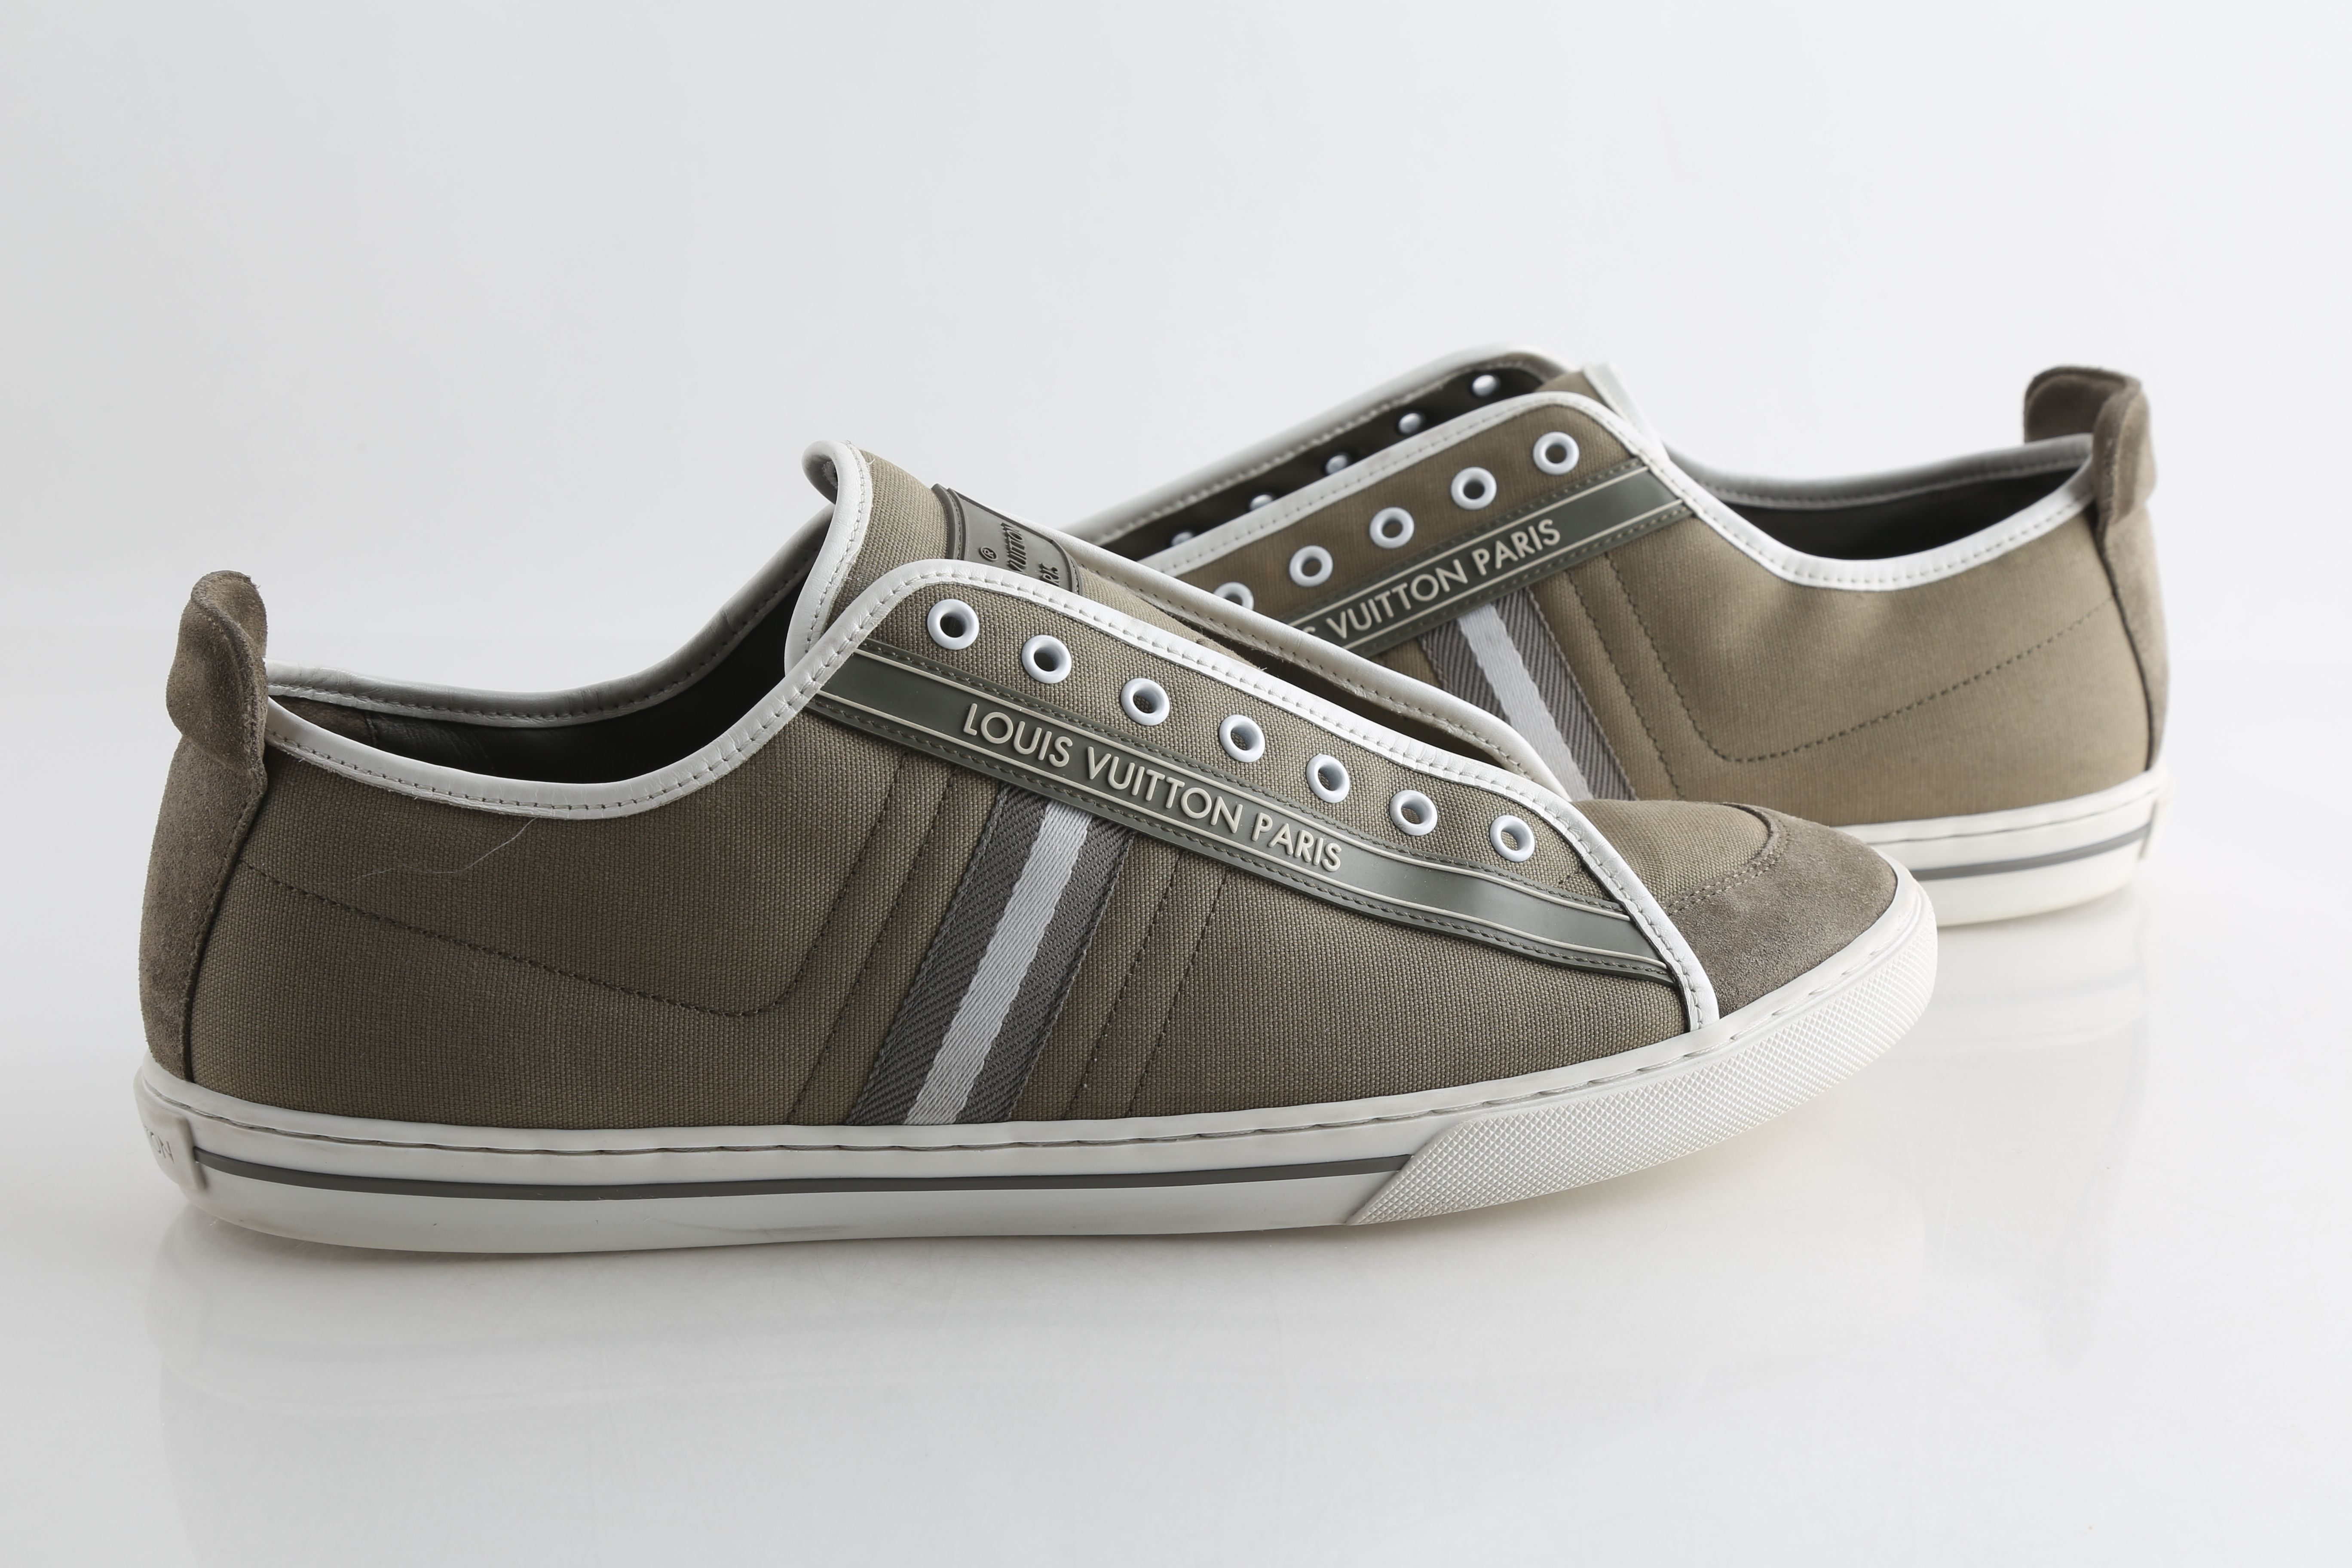 louis vuitton low sneakers